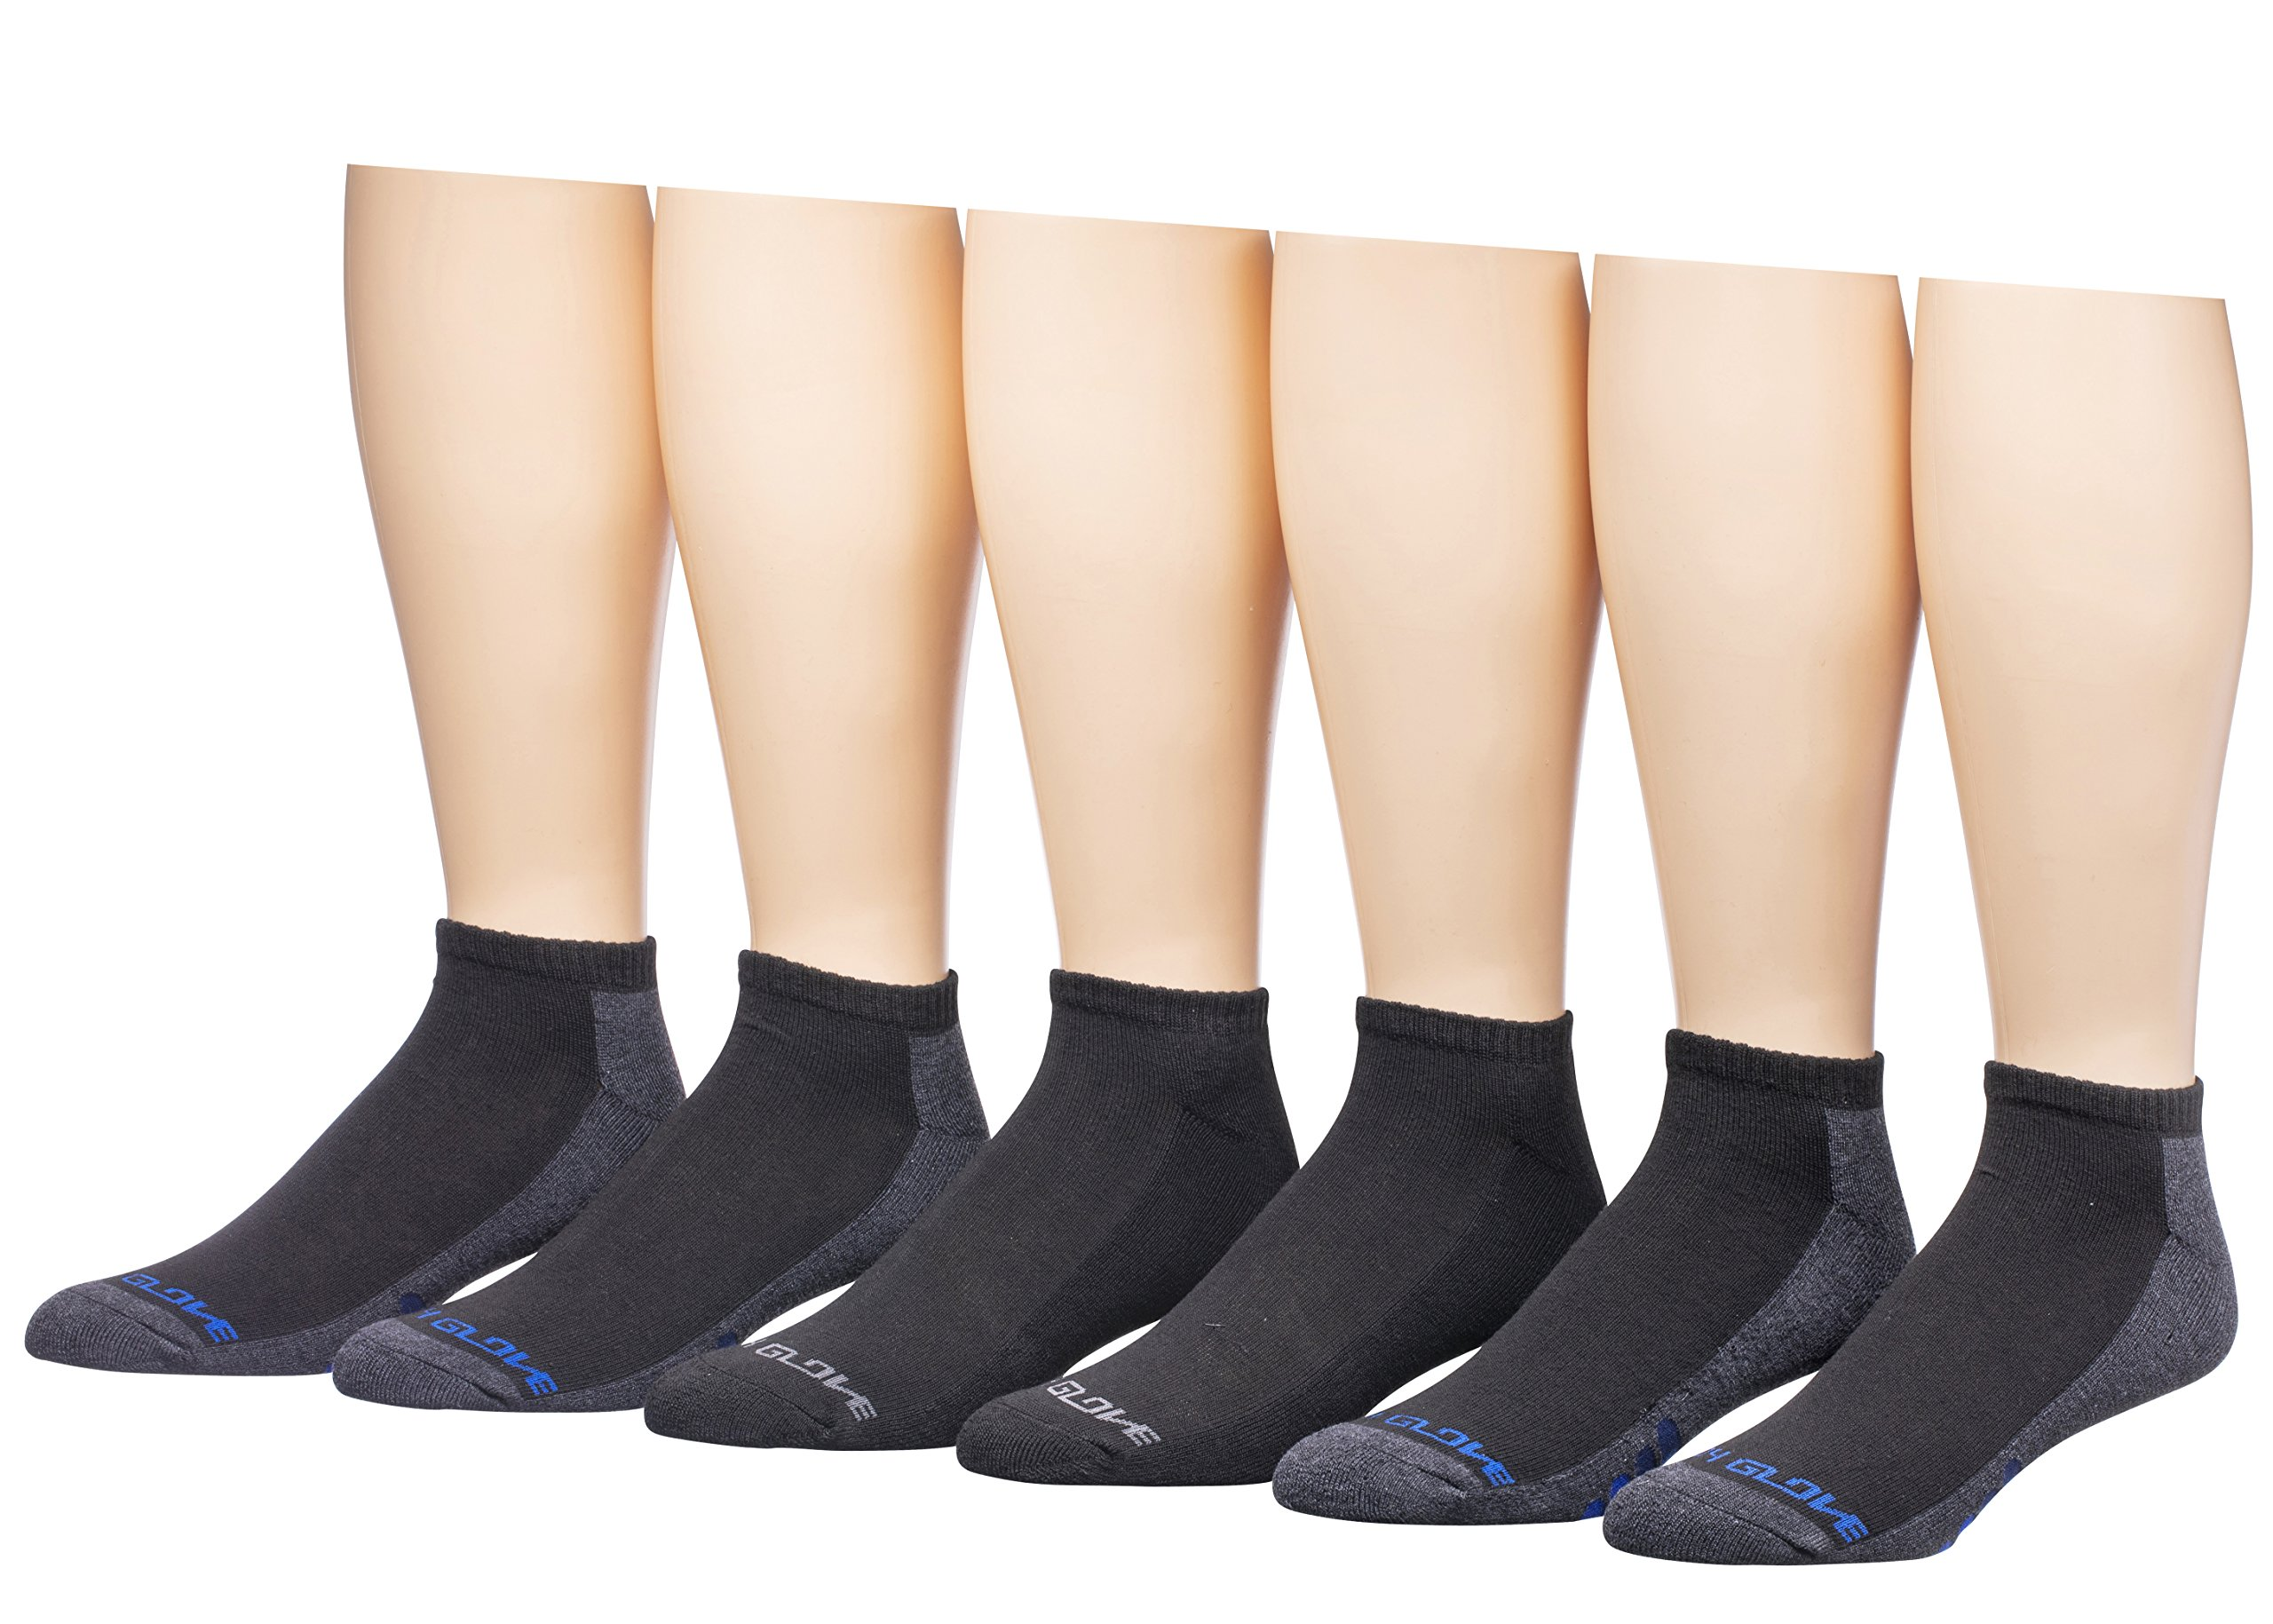 BodyGlove Men's Low Cut Socks, 6 Pack (Black with Blue/Grey)